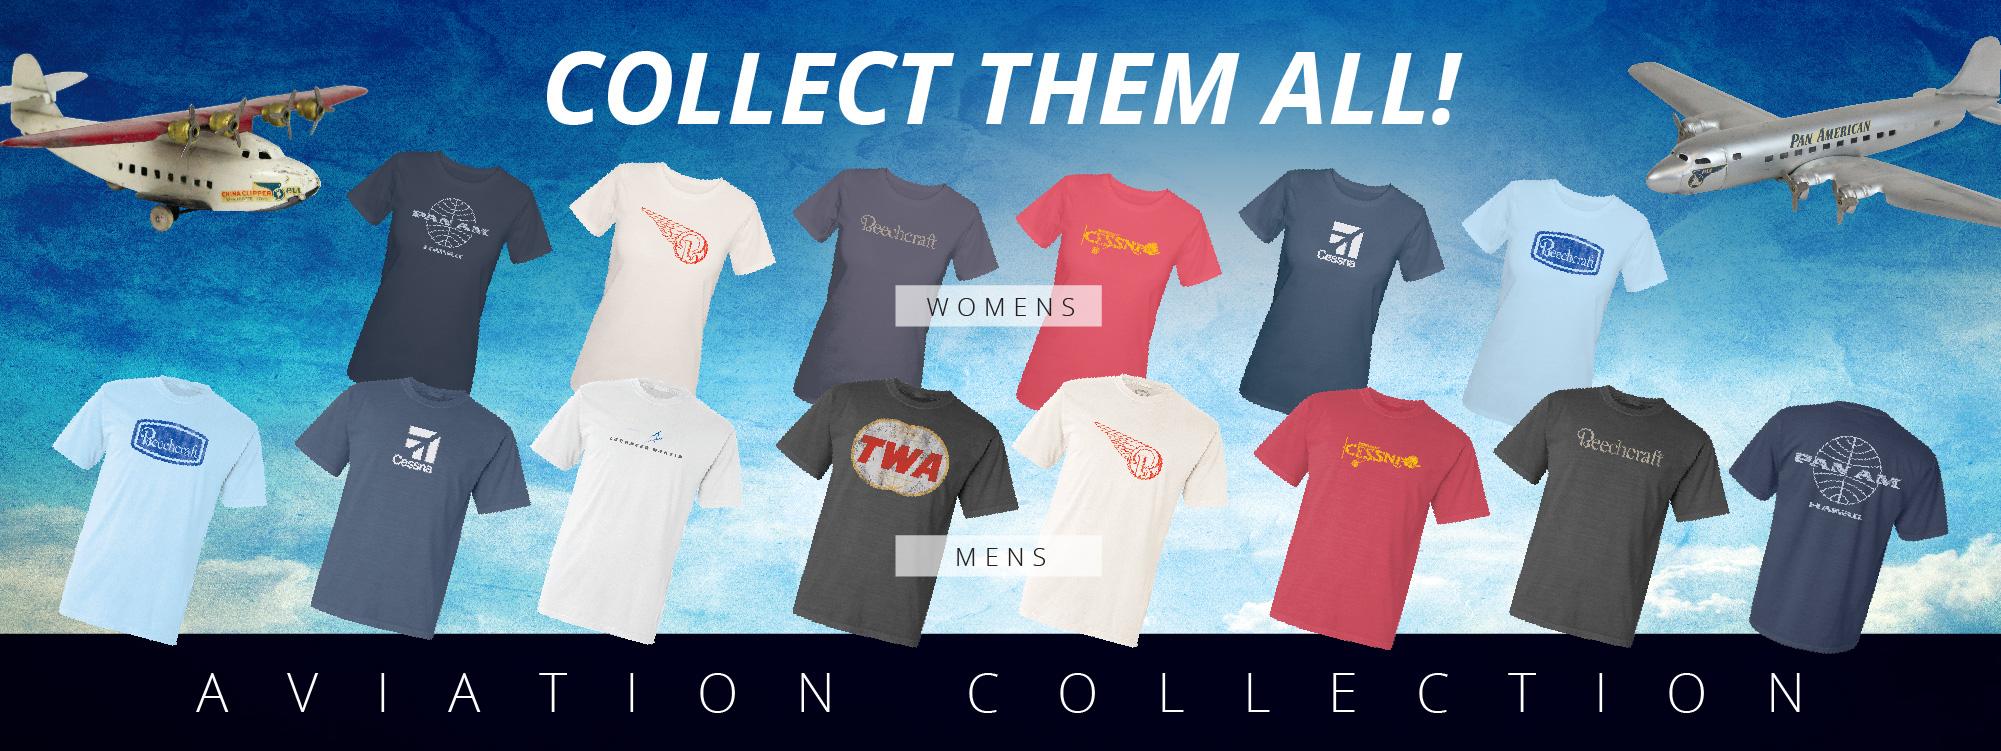 aviation t shirts